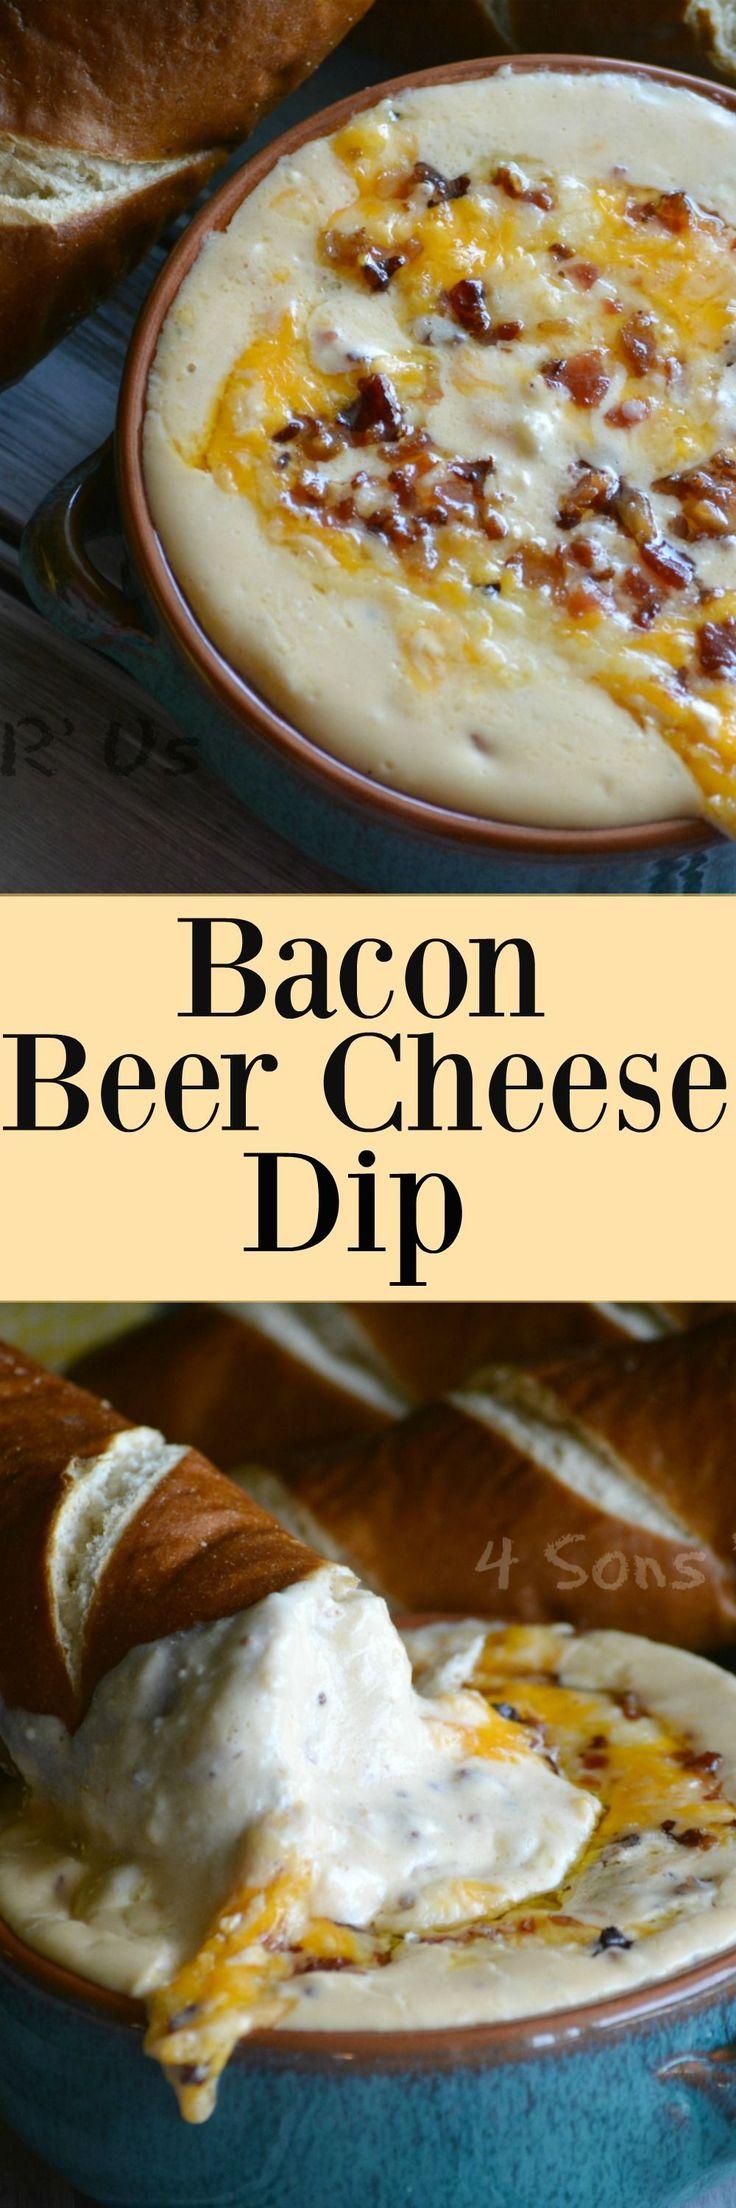 bacon-beer-cheese-dip-pin (party food sides dip recipes)